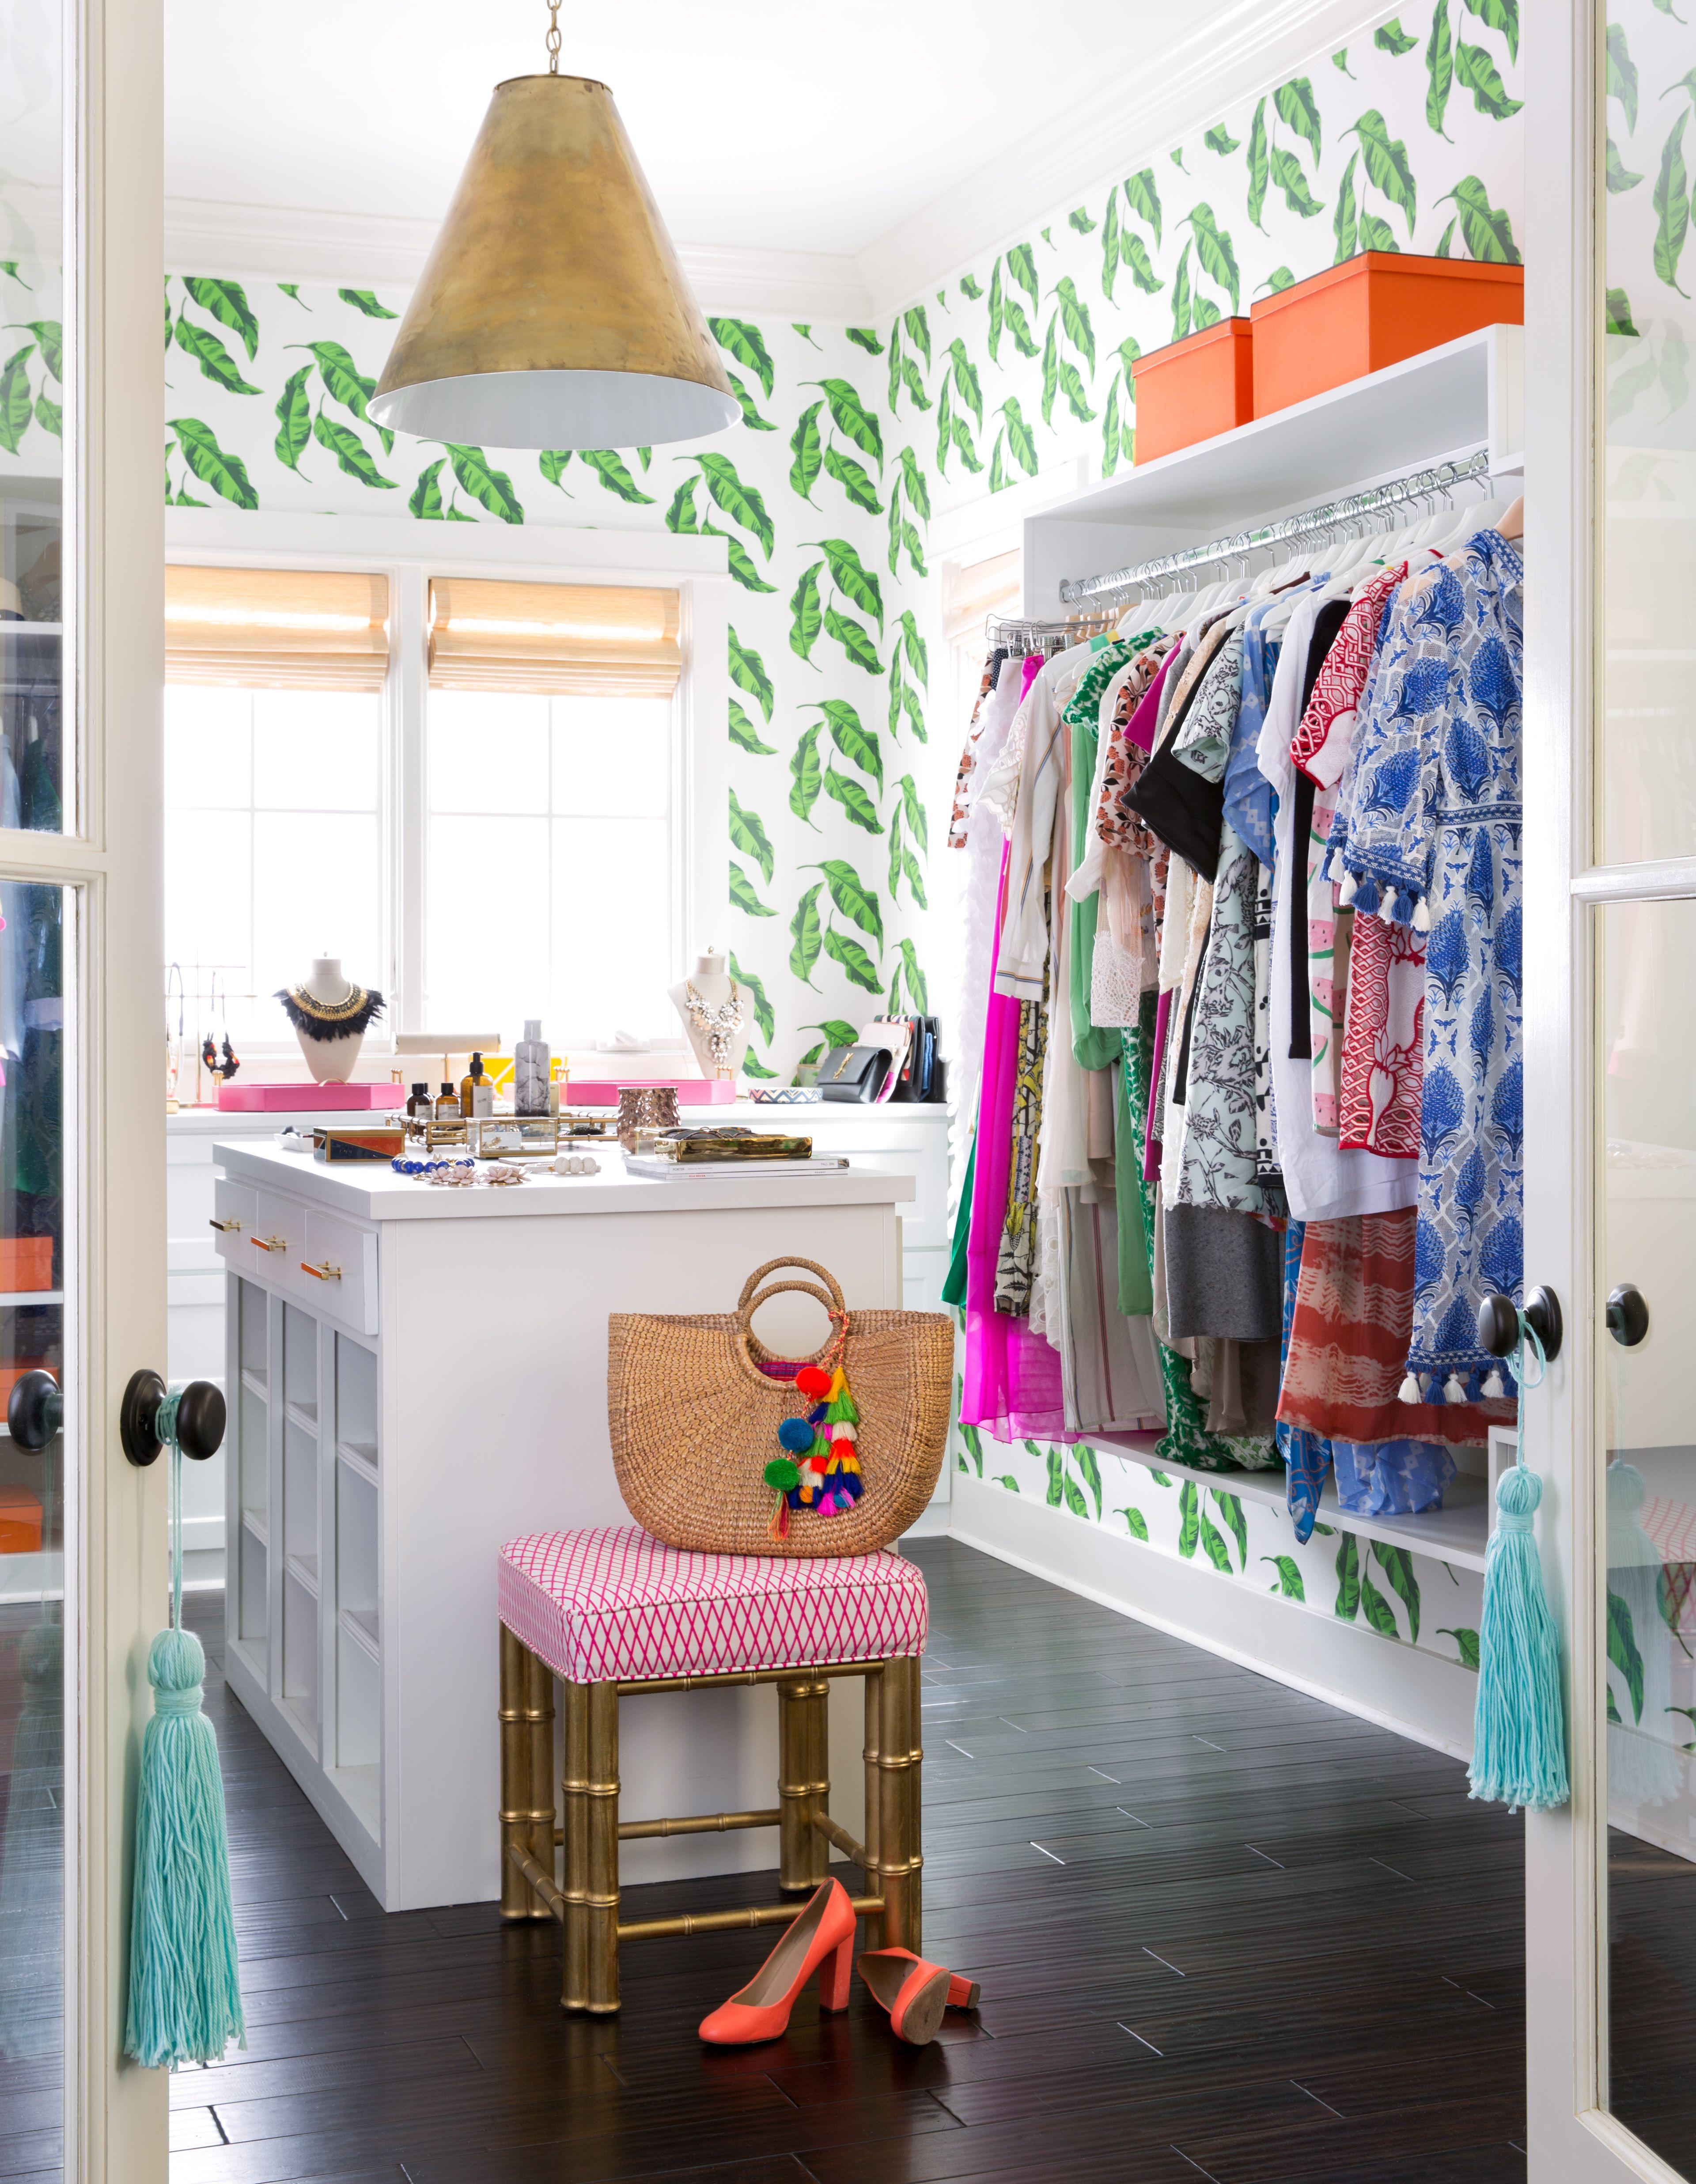 Banana Leaves wallpaper in a master closet. No closet